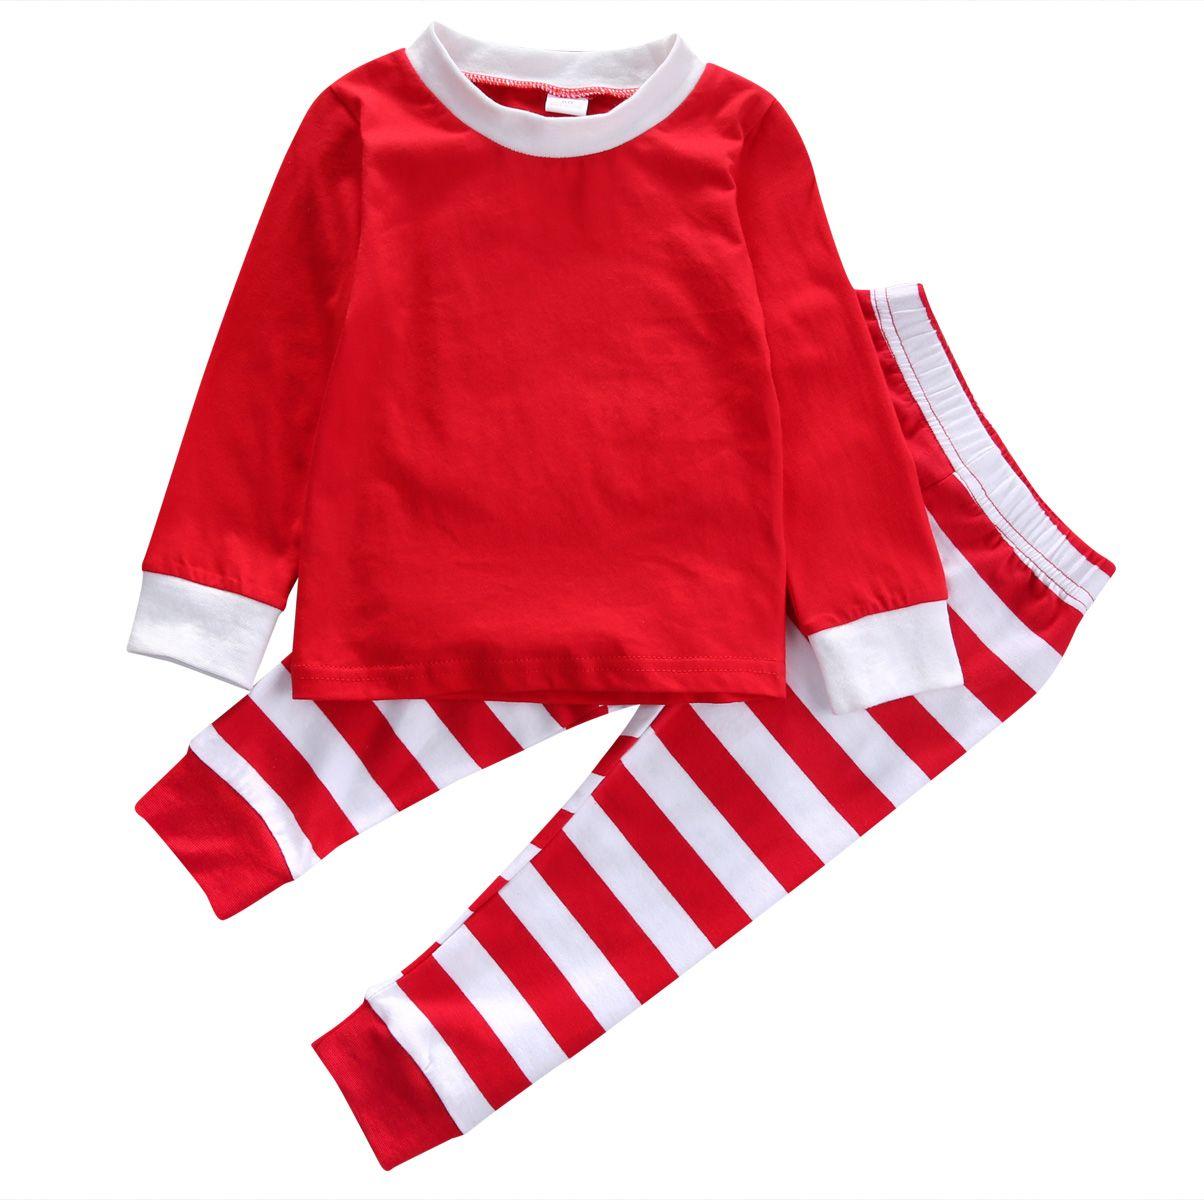 Toddler Christmas Pajamas.Christmas Pajama Sets Toddler Kids Baby Boy Girls Striped Outfits Christmas Pajamas Sleepwear Set Little Girls Pajamas Kid Pjs From Roohua Price